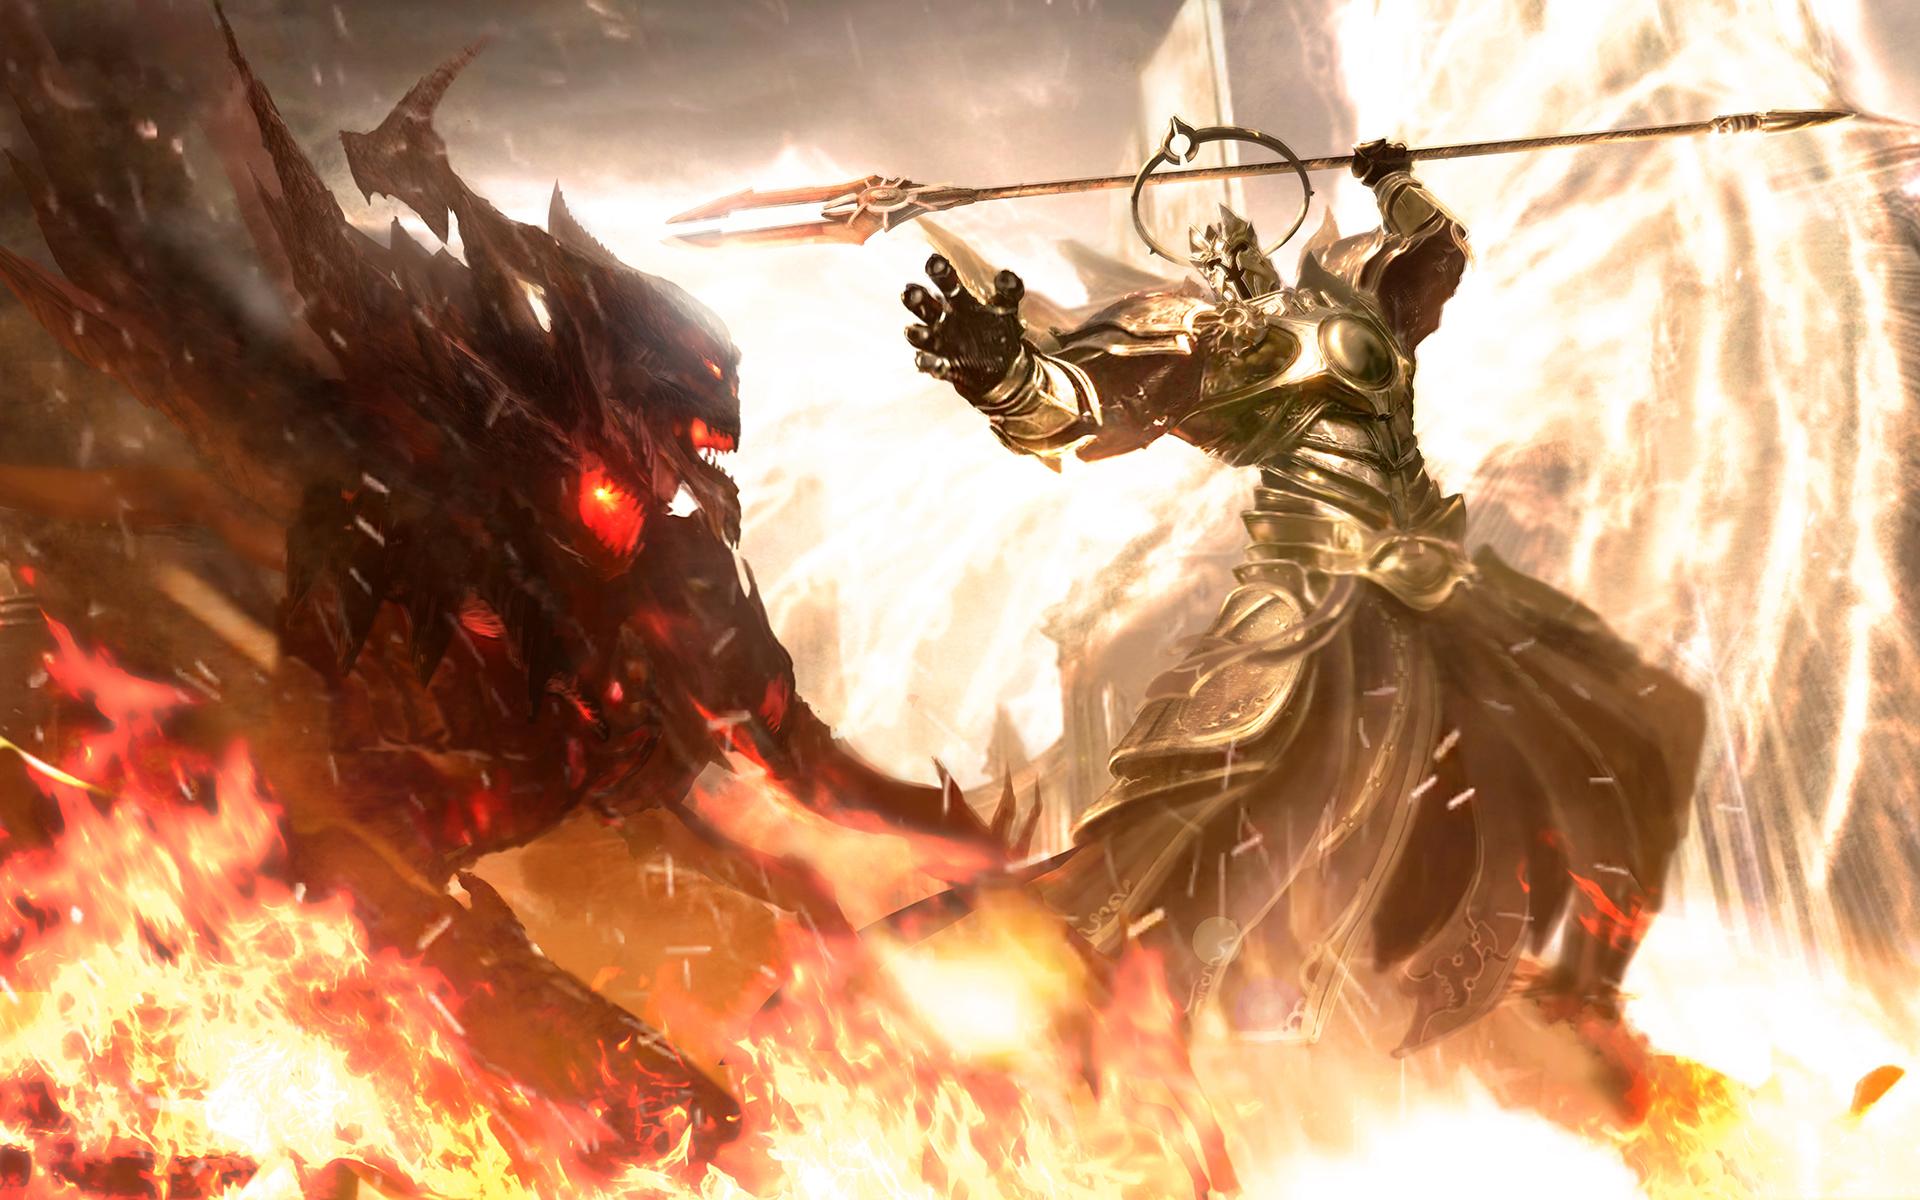 Diablo III Full HD Wallpaper and Background